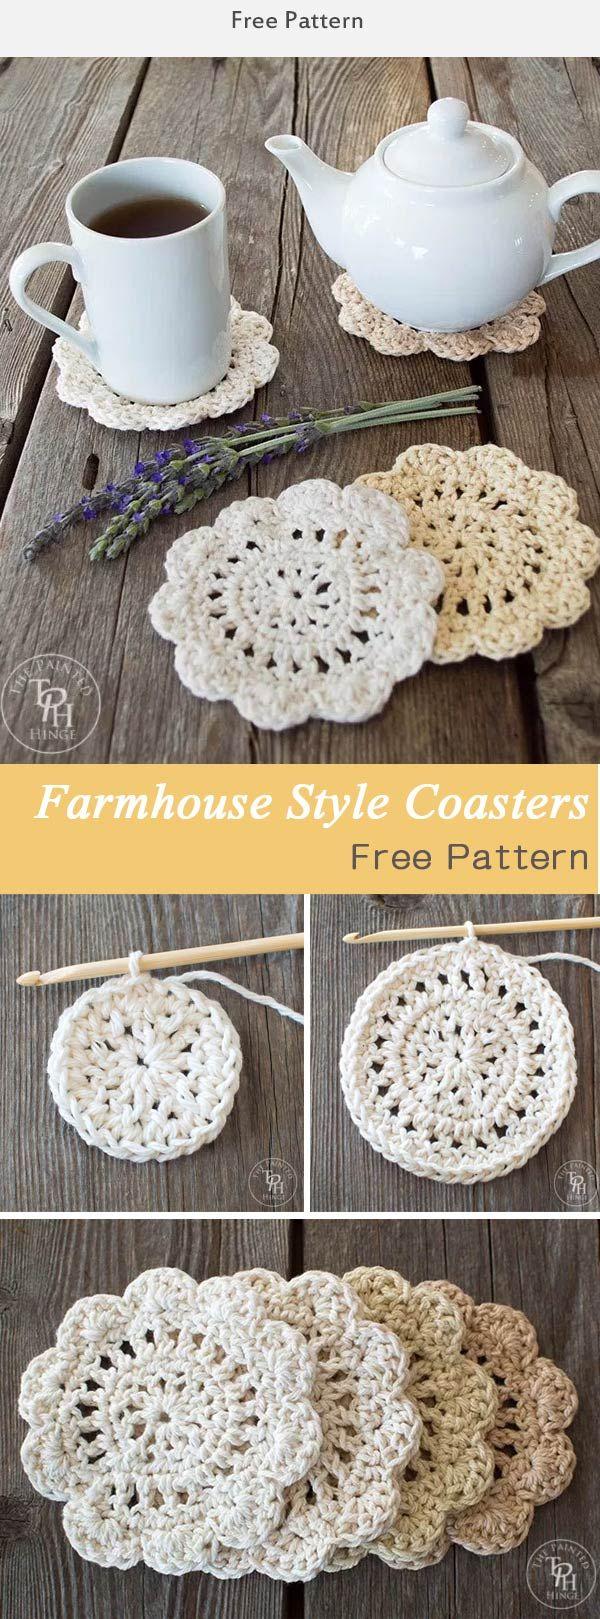 Farmhouse Style Coasters Crochet Free Pattern